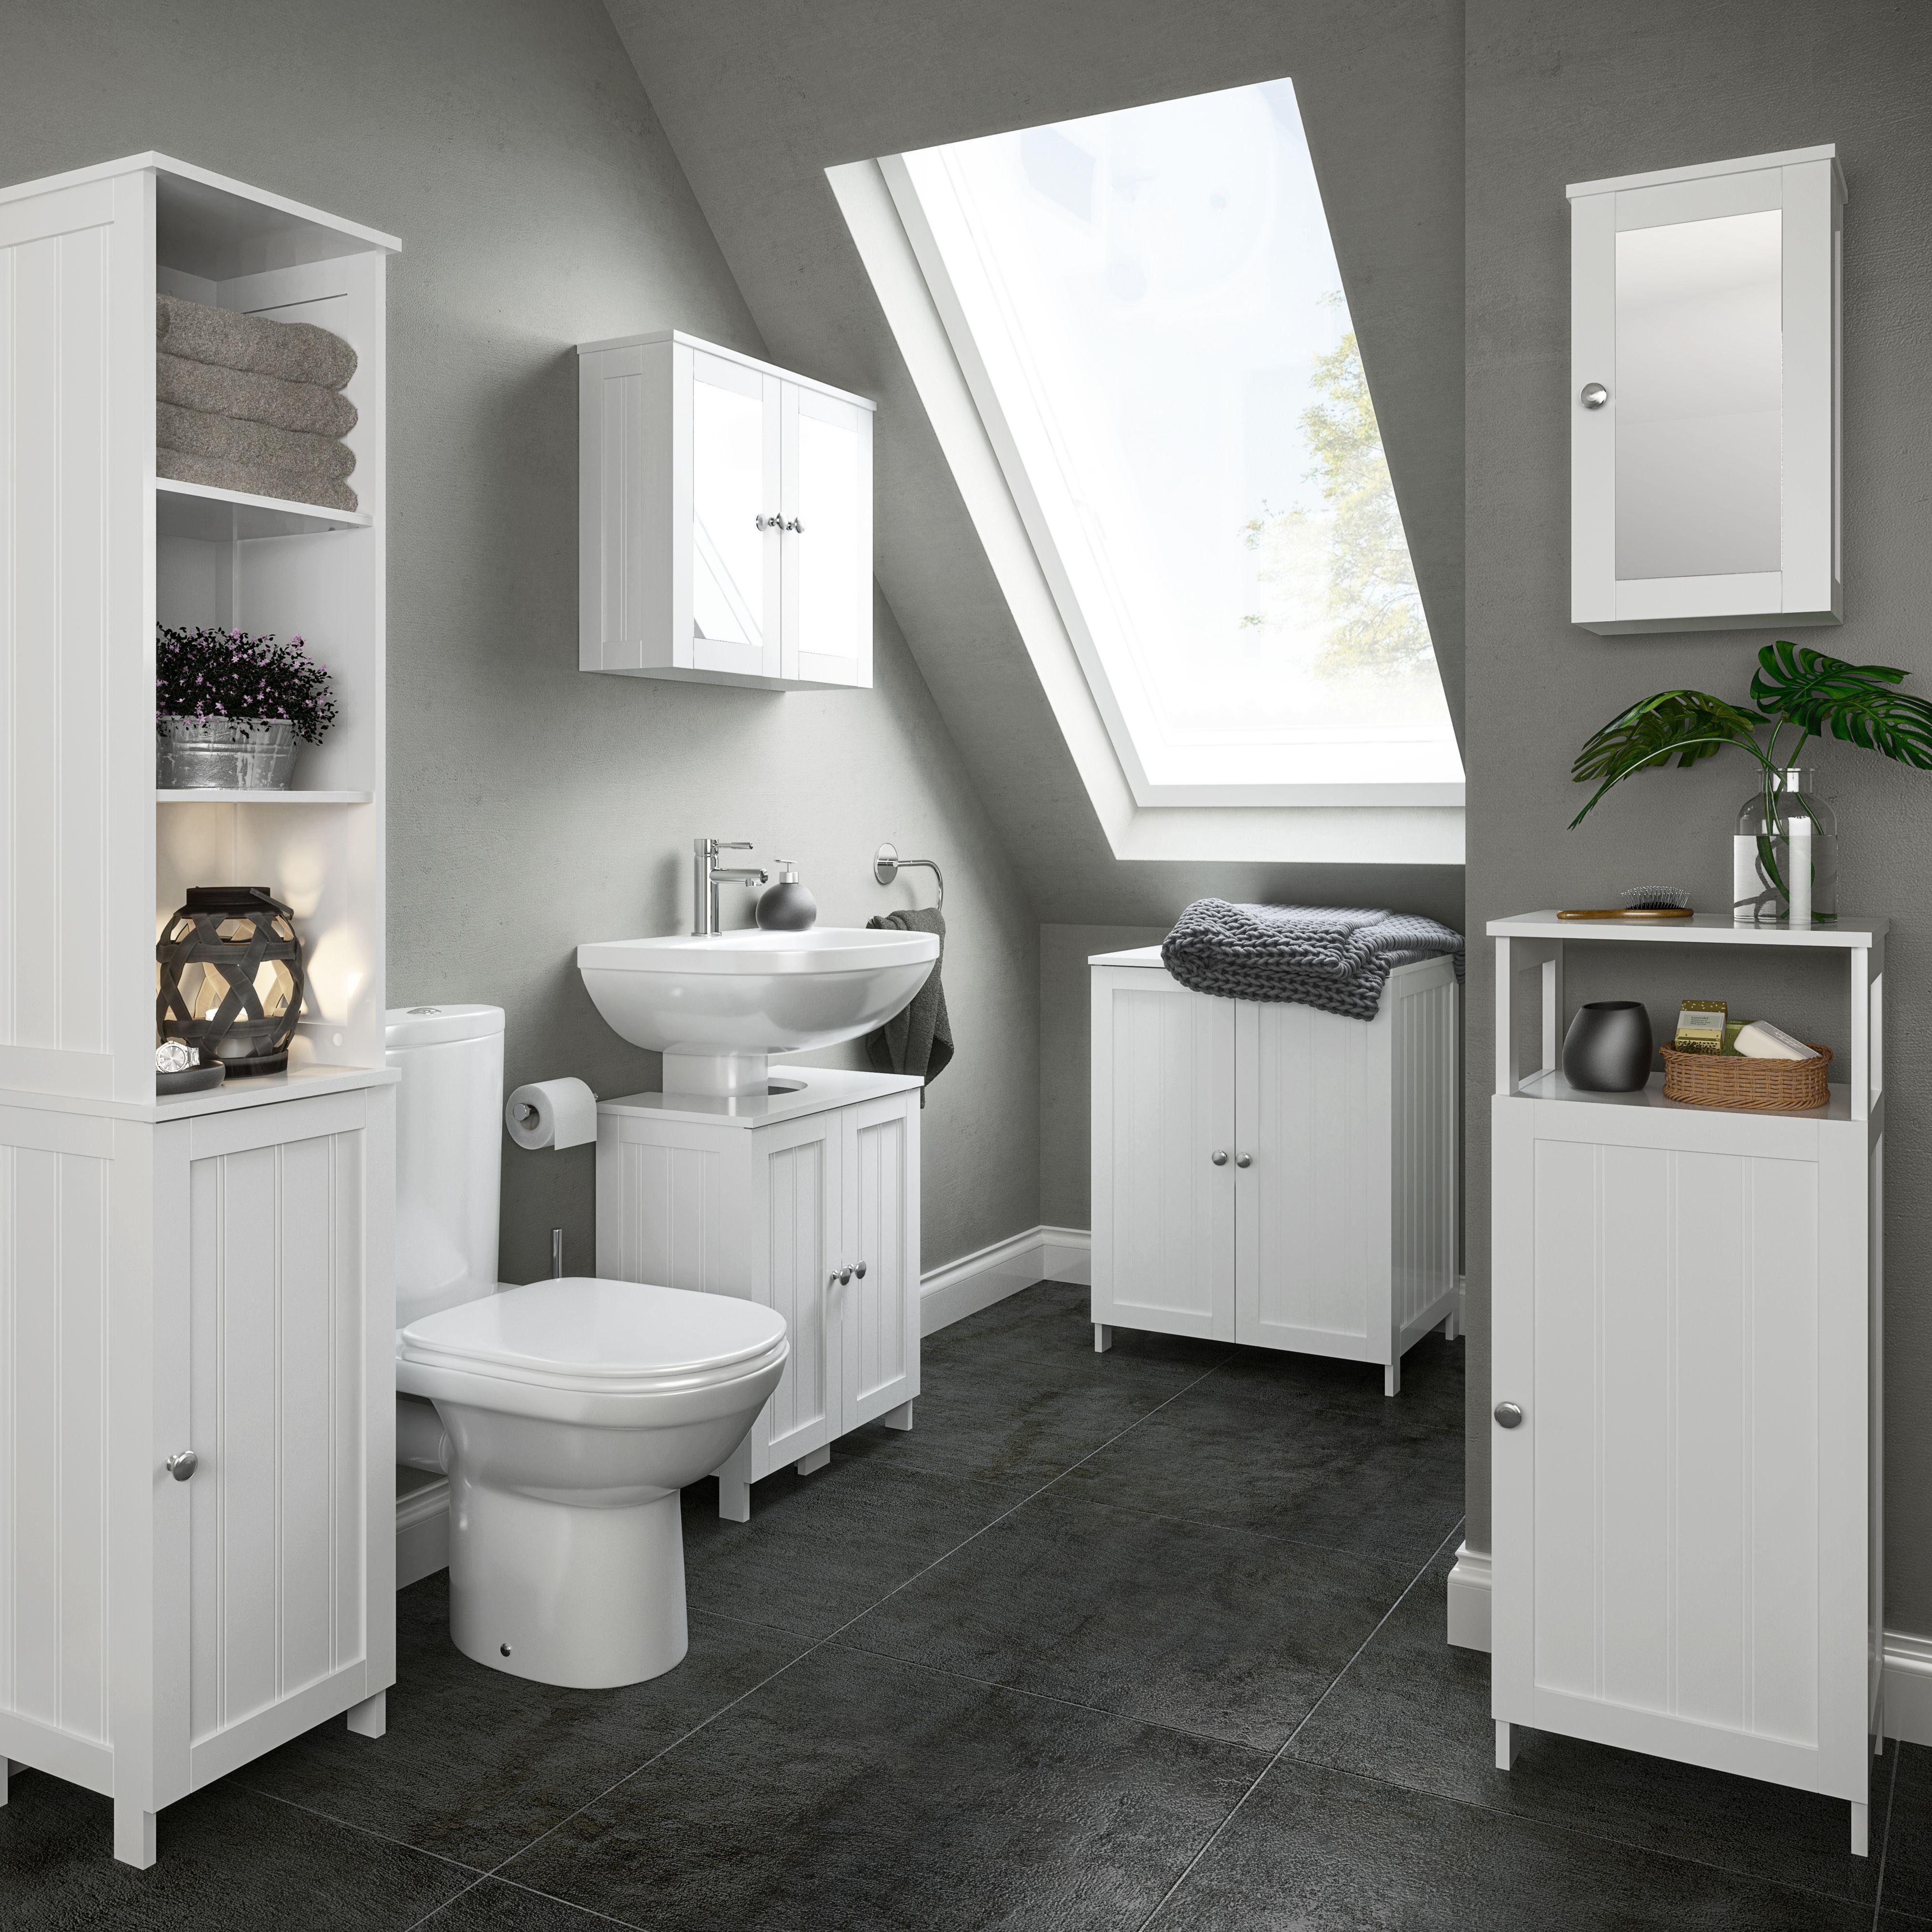 B&Q Nicolina range Tall storage unit, Floor standing